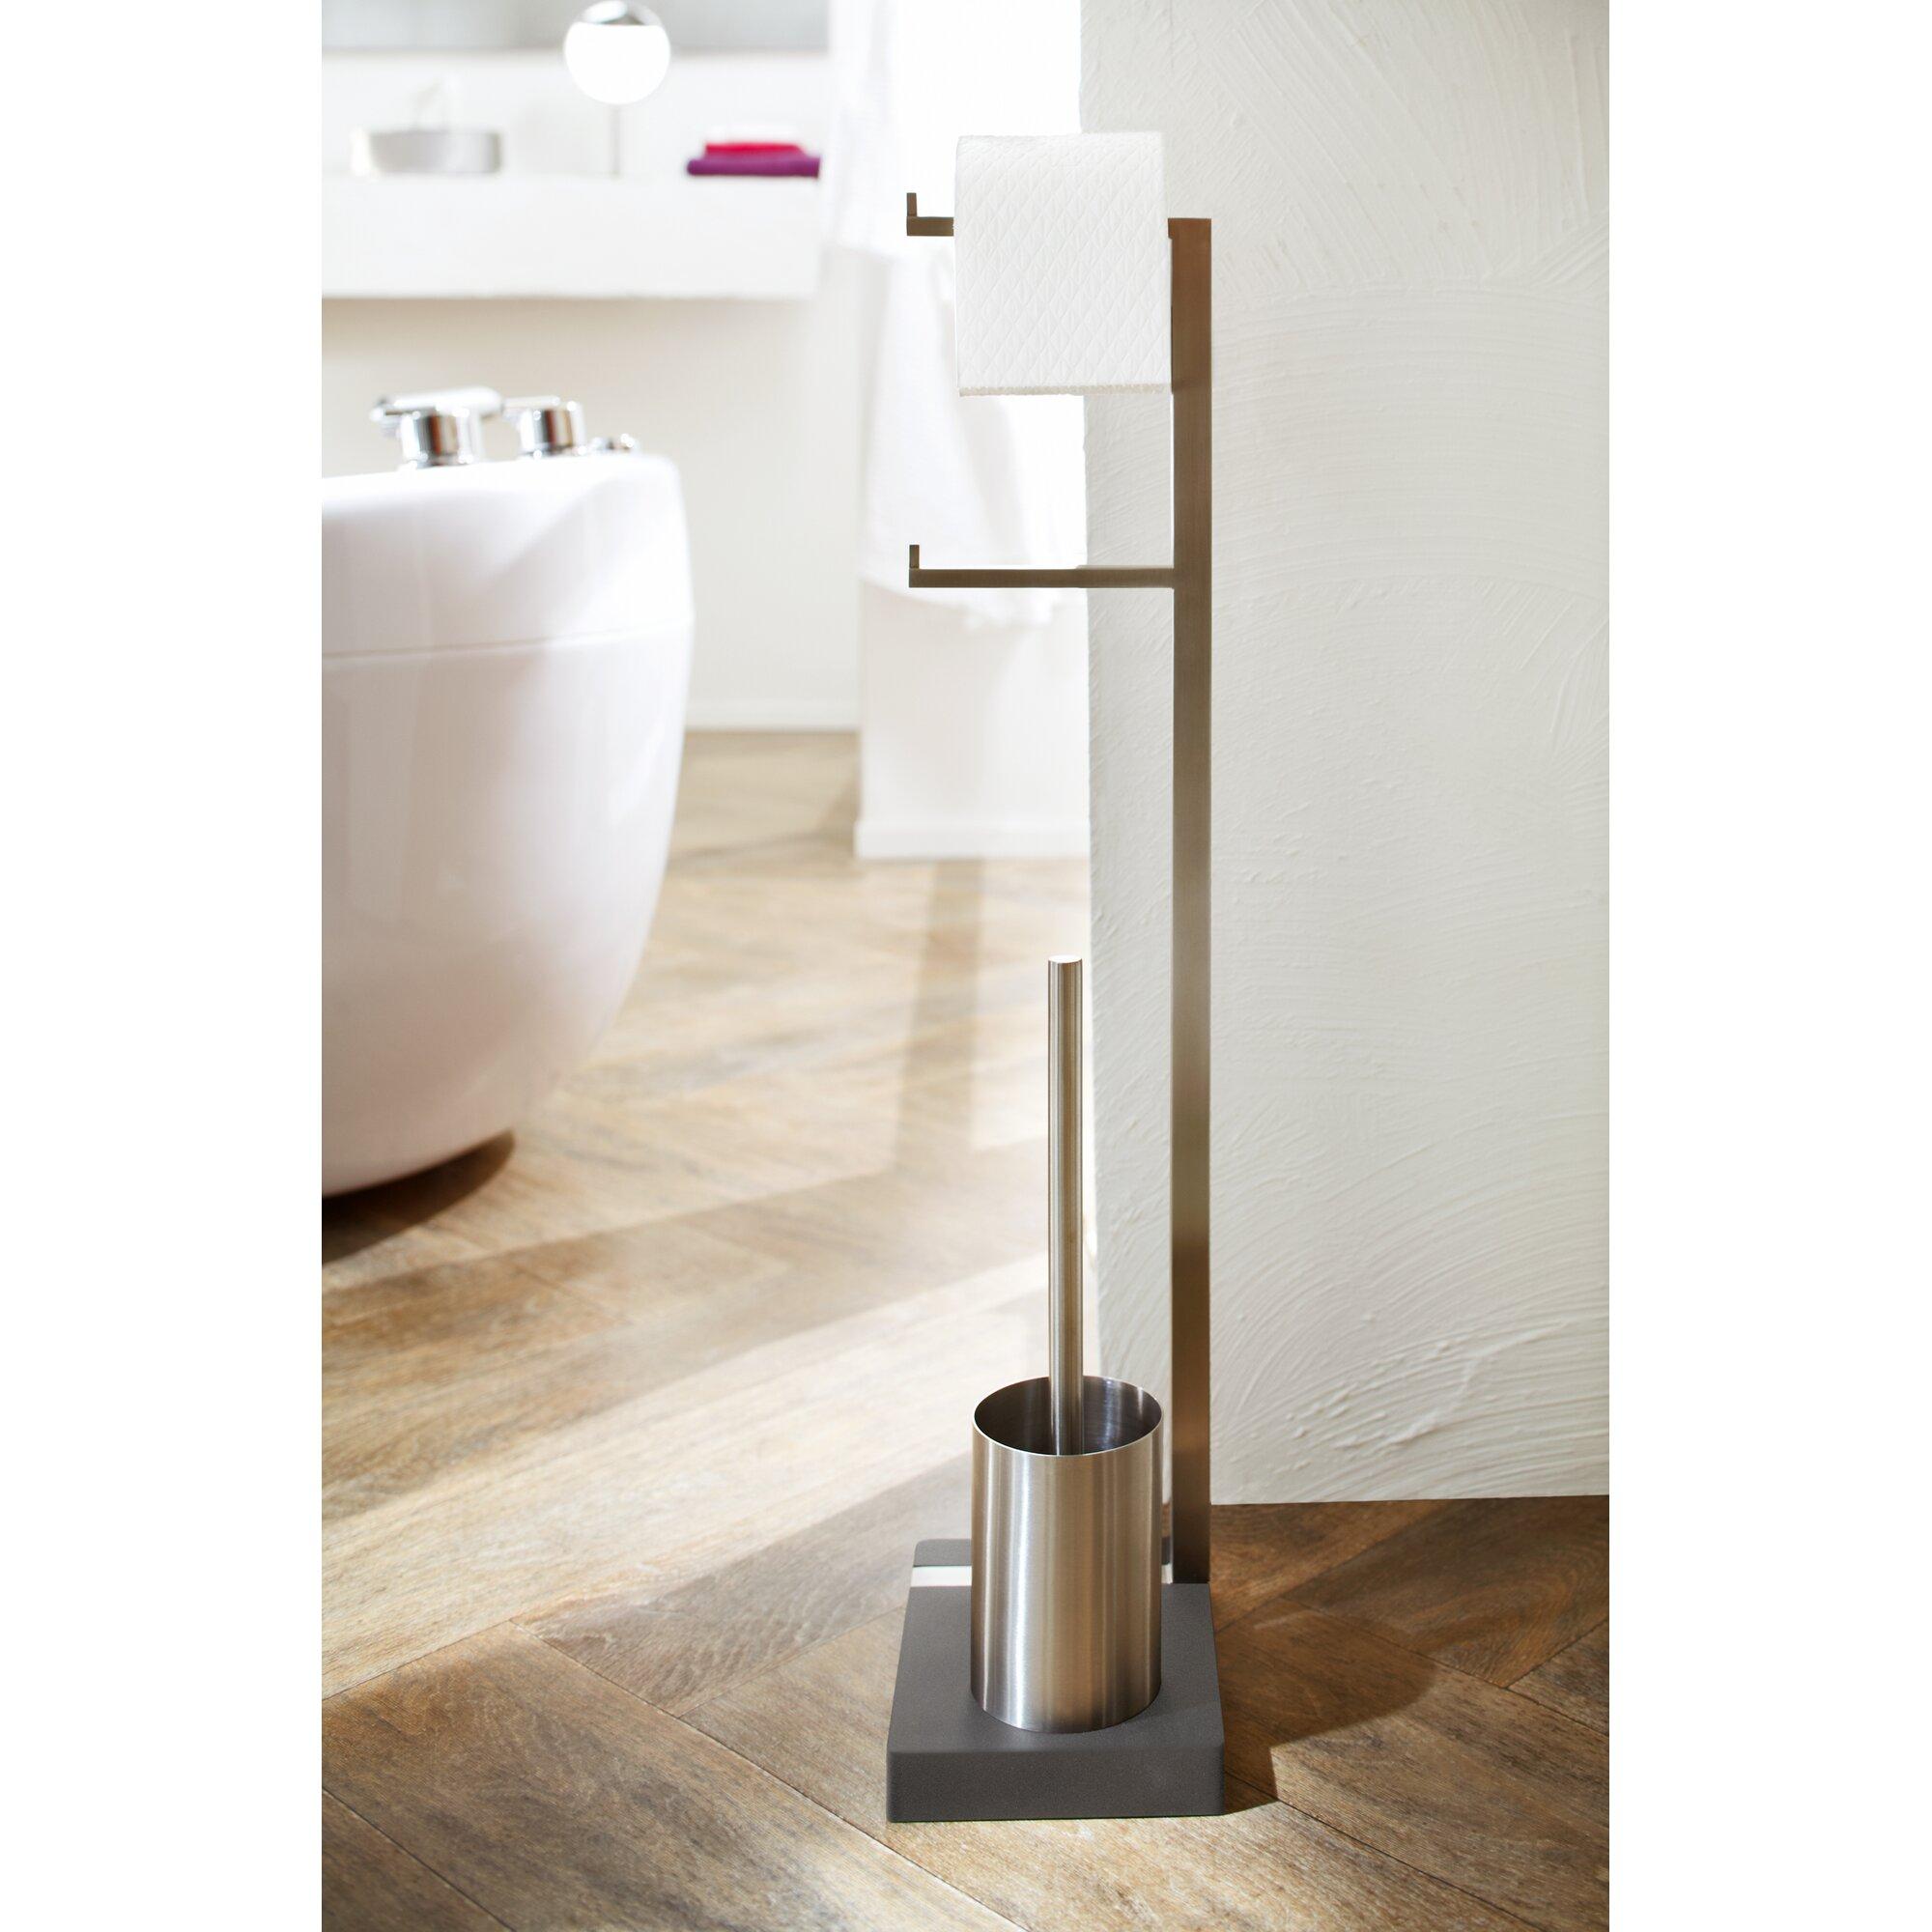 free standing toilet - menoto free standing toilet brush set reviews allmodern